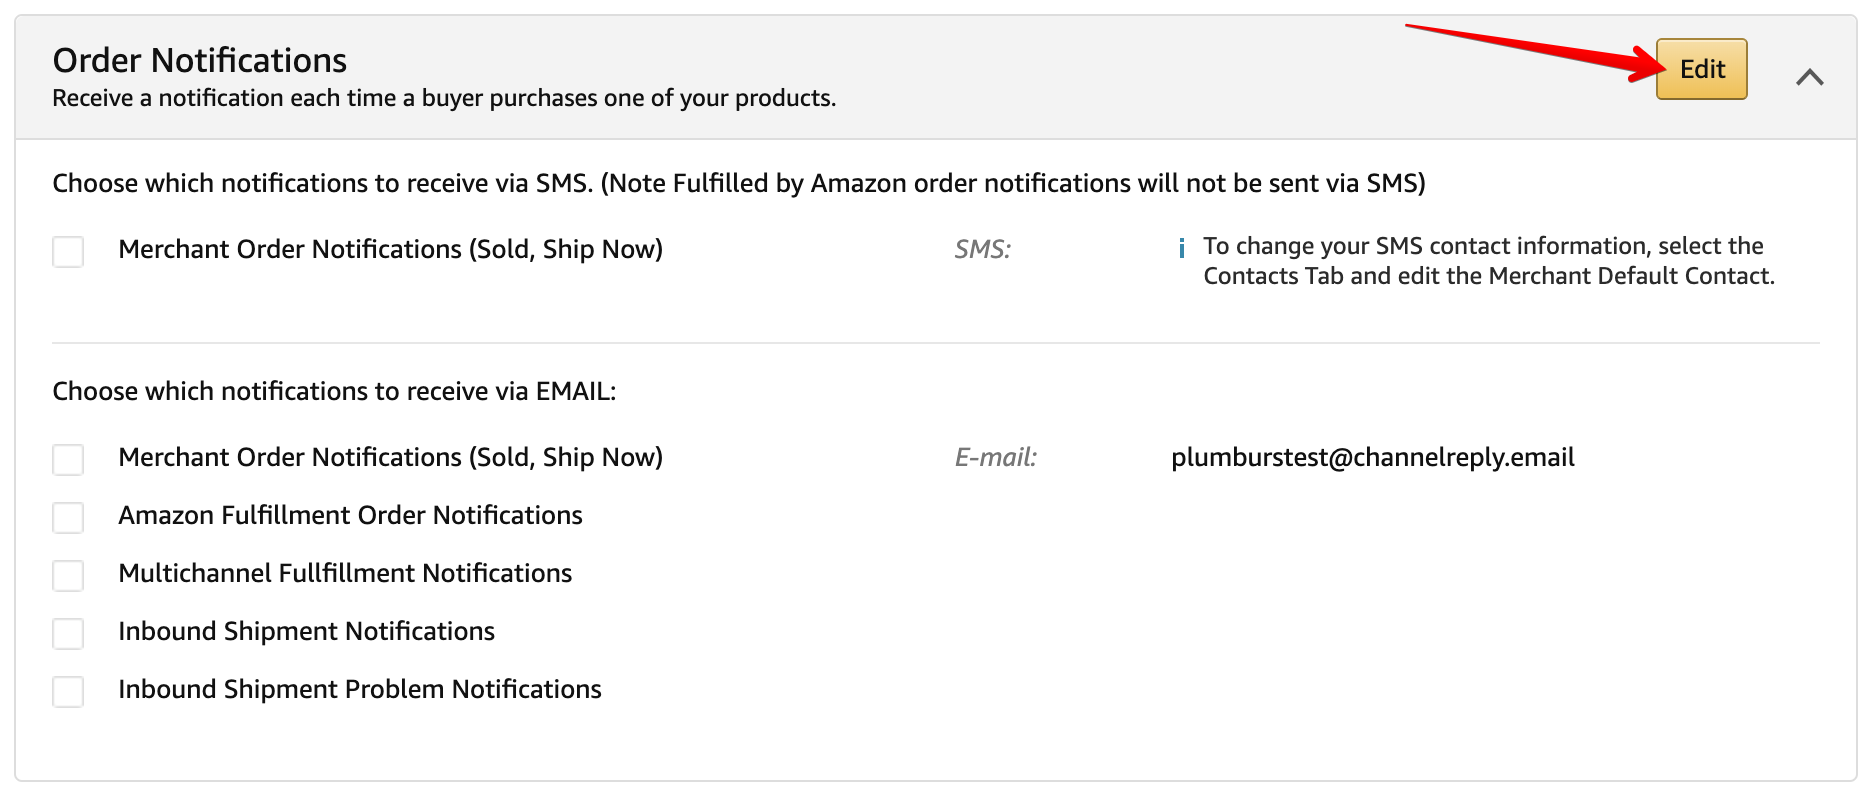 Edit Amazon Order Notifications